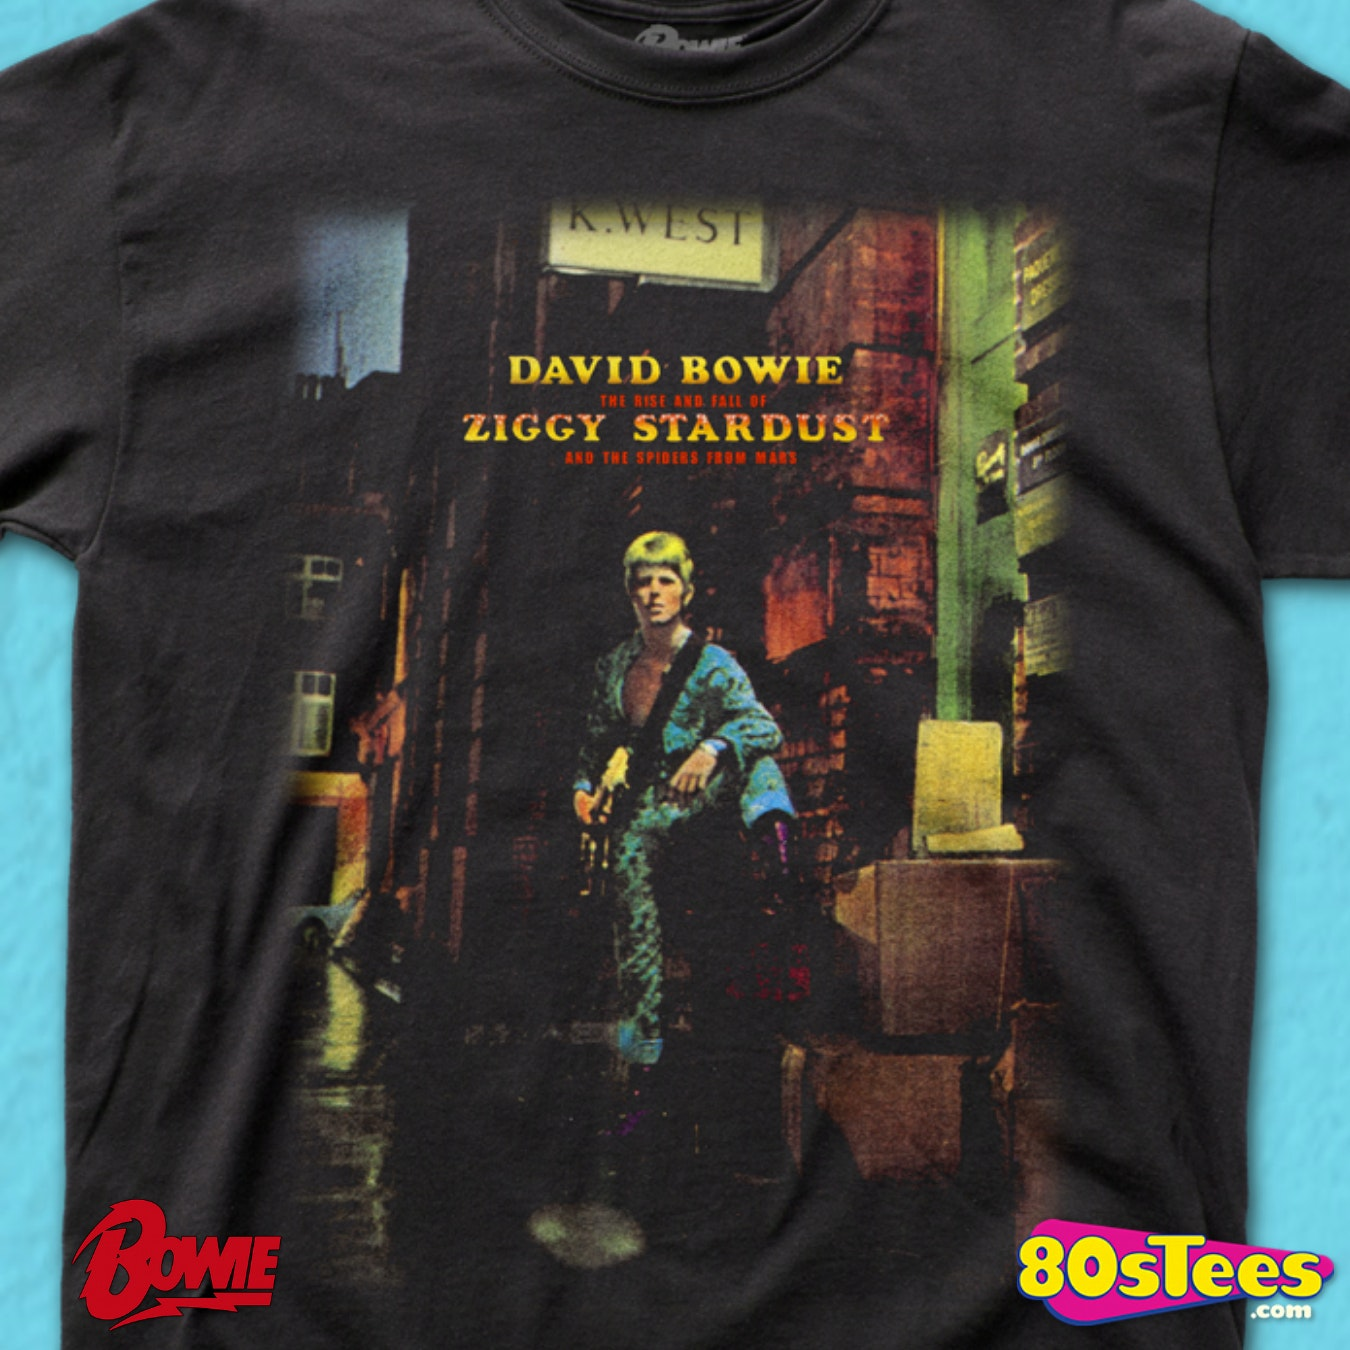 One of a Kind Custom Band Shirt Review Measurements David Bowie Ziggy Stardust World Tour T-Shirt Vintage Style Unisex Sz L